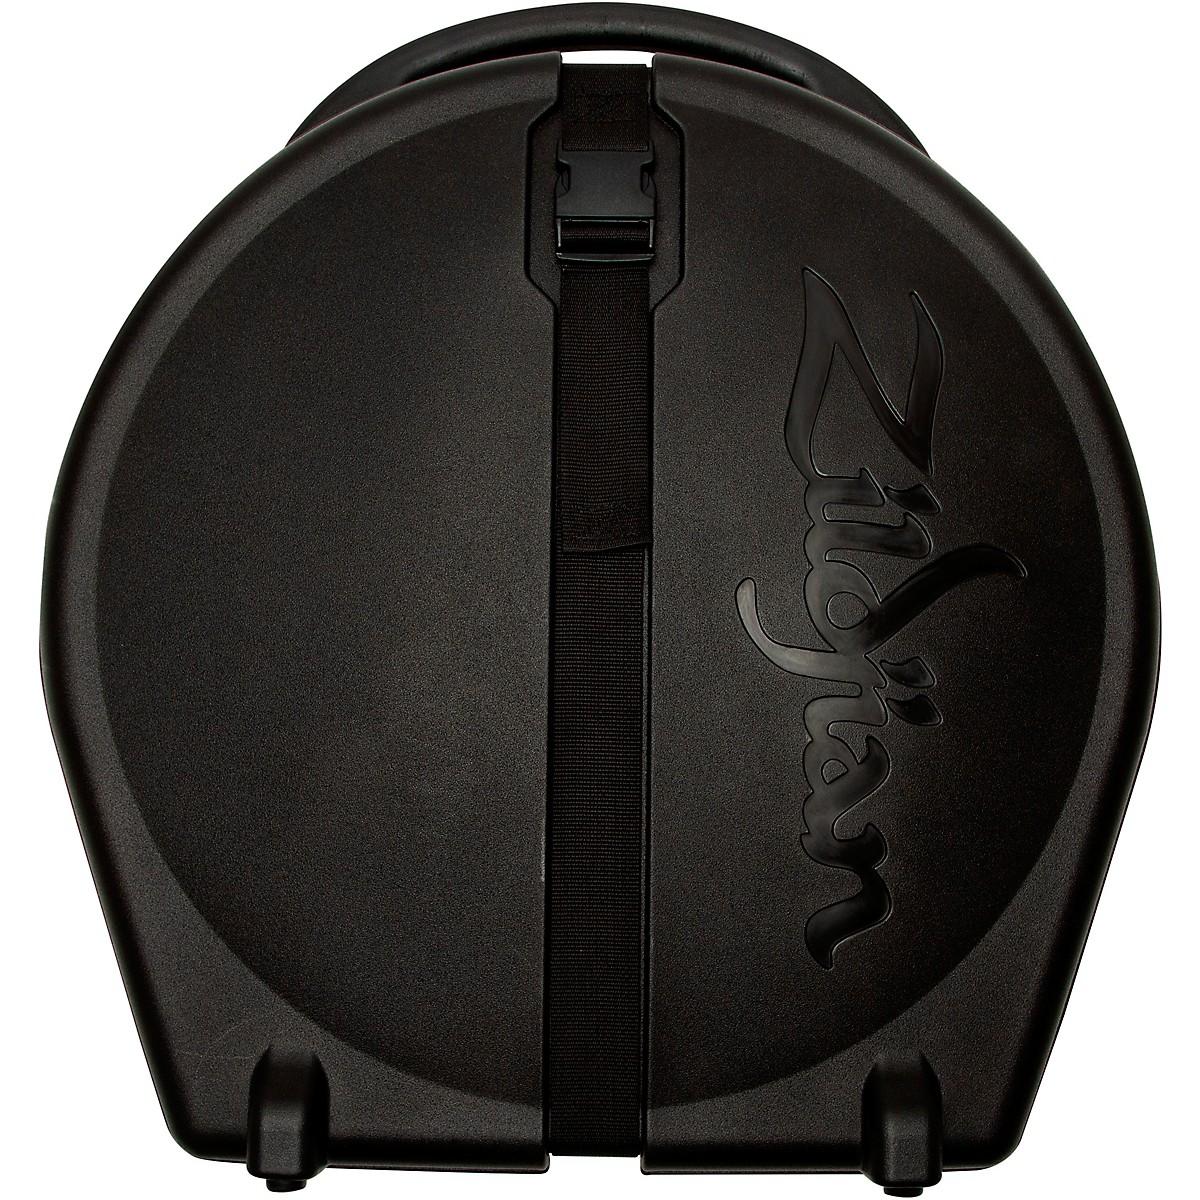 Zildjian Rolling Cymbal Vault